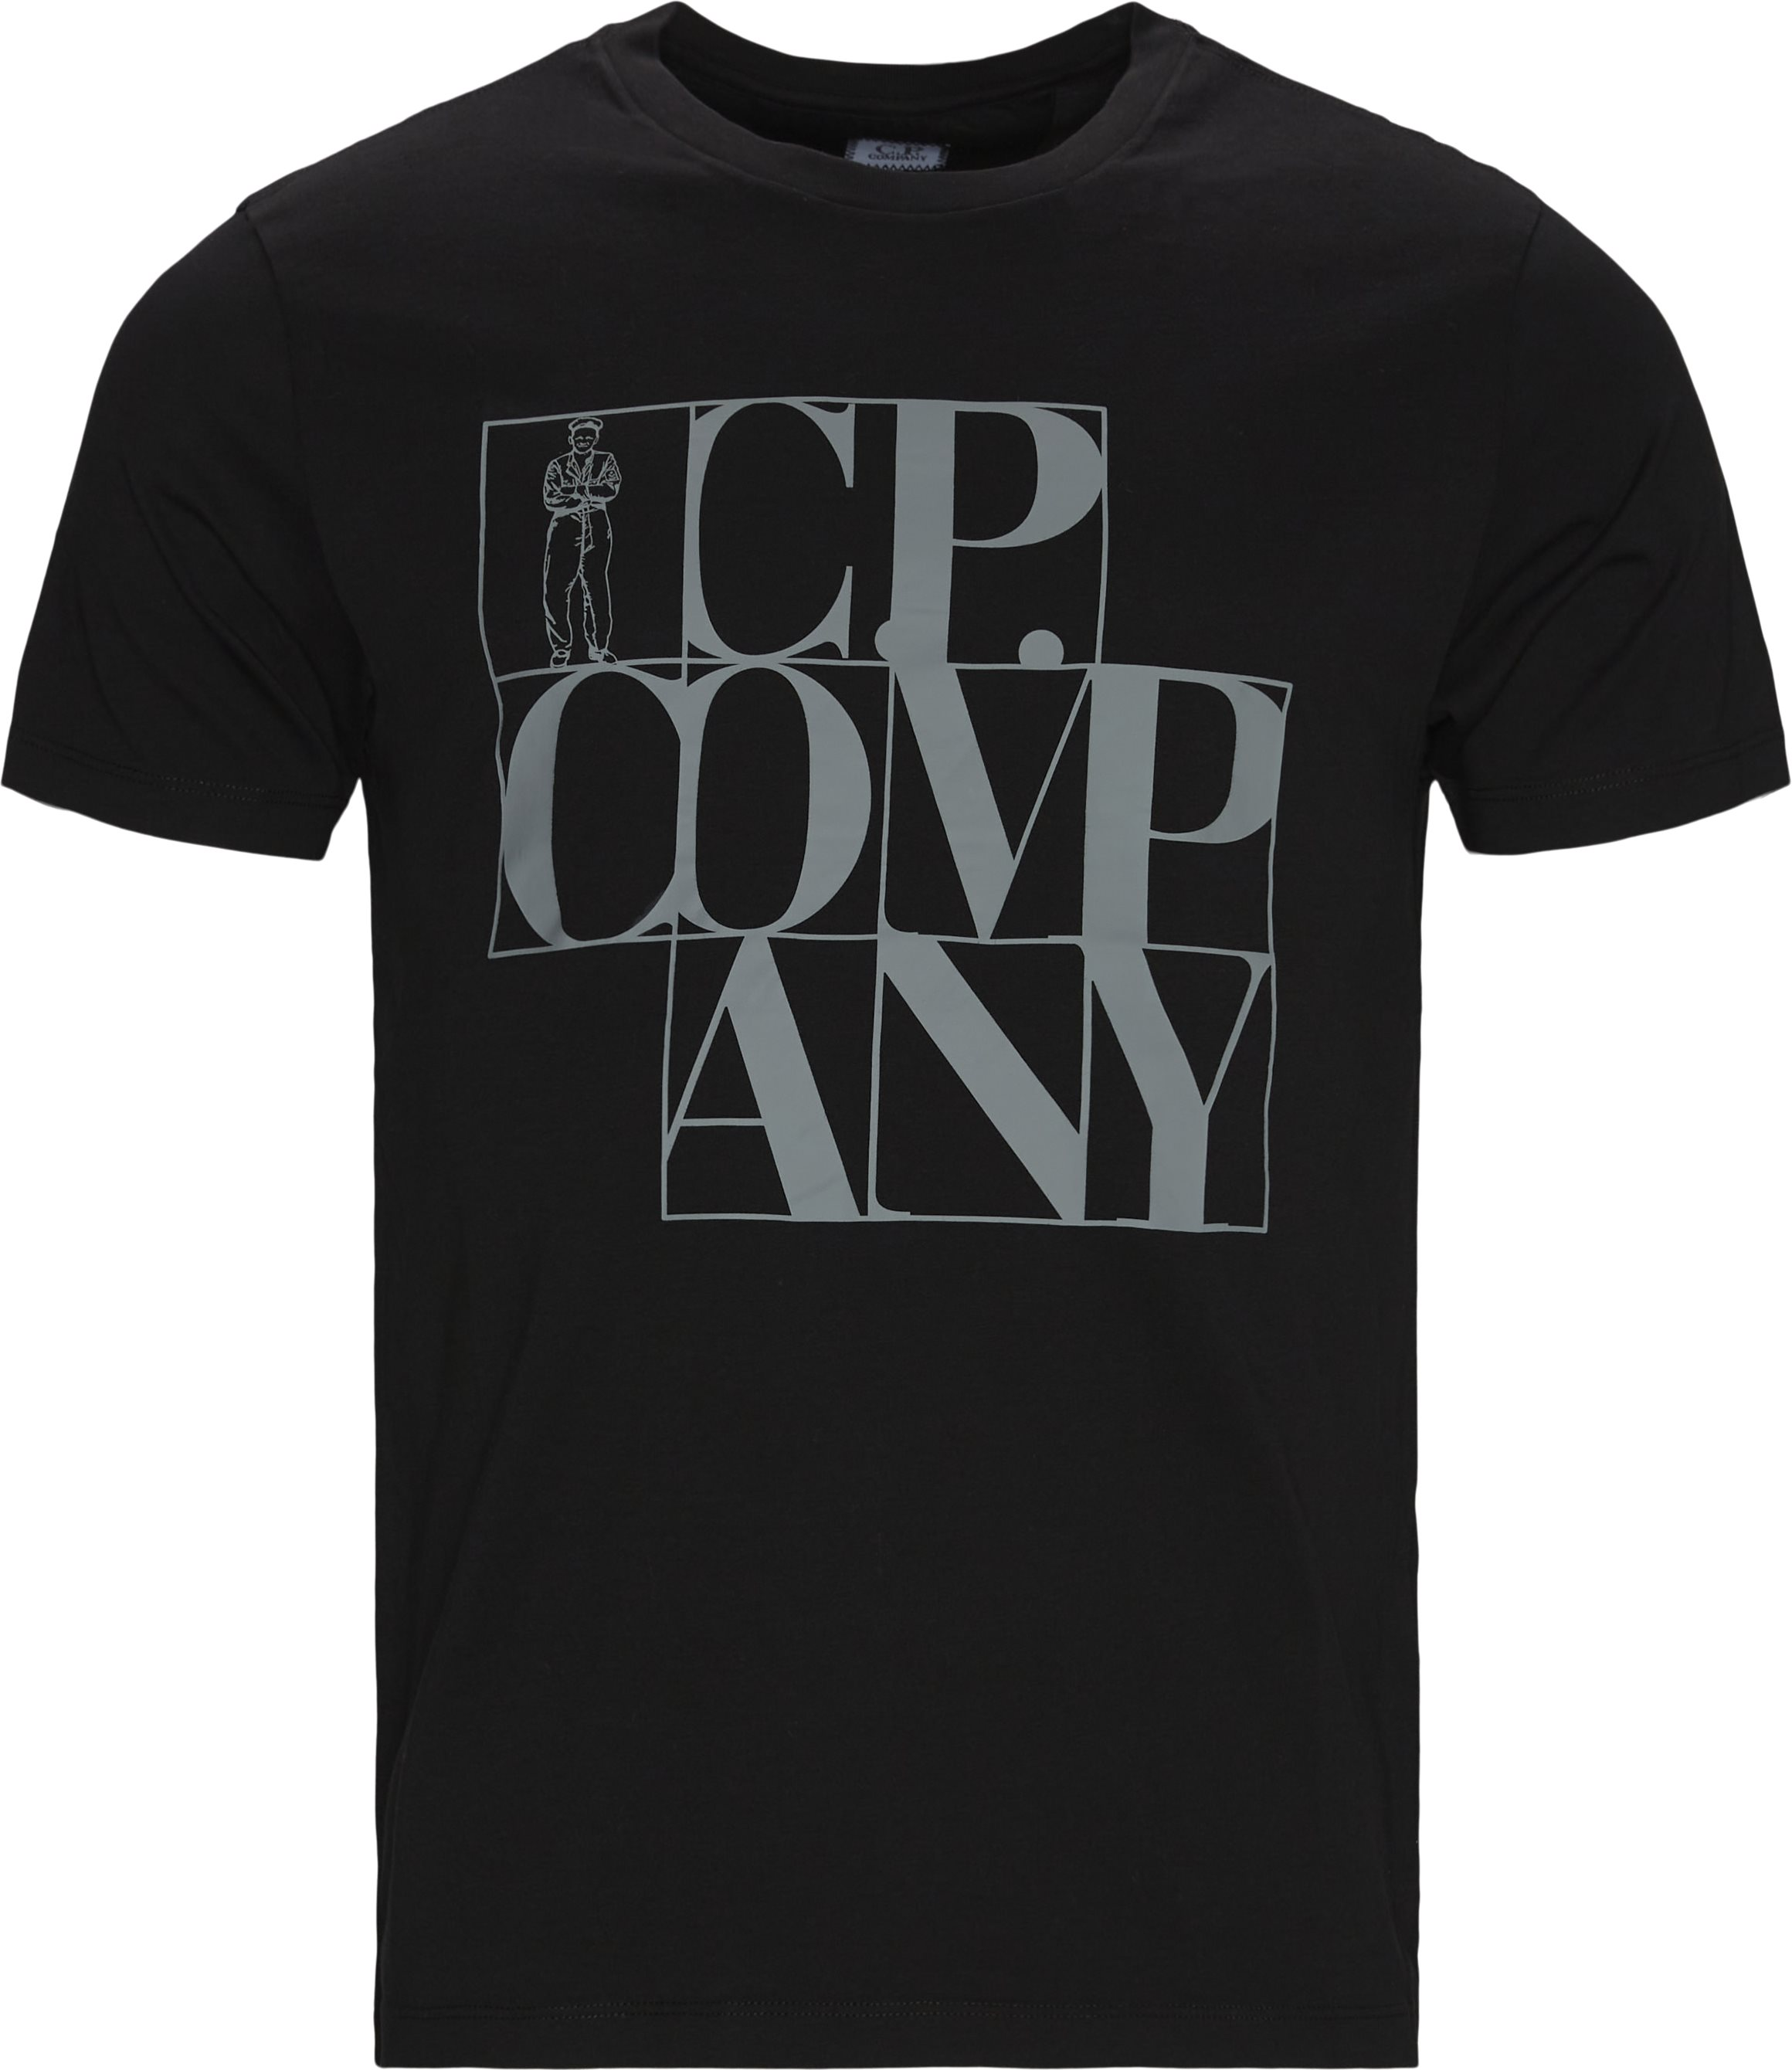 Print Tee - T-shirts - Regular fit - Sort